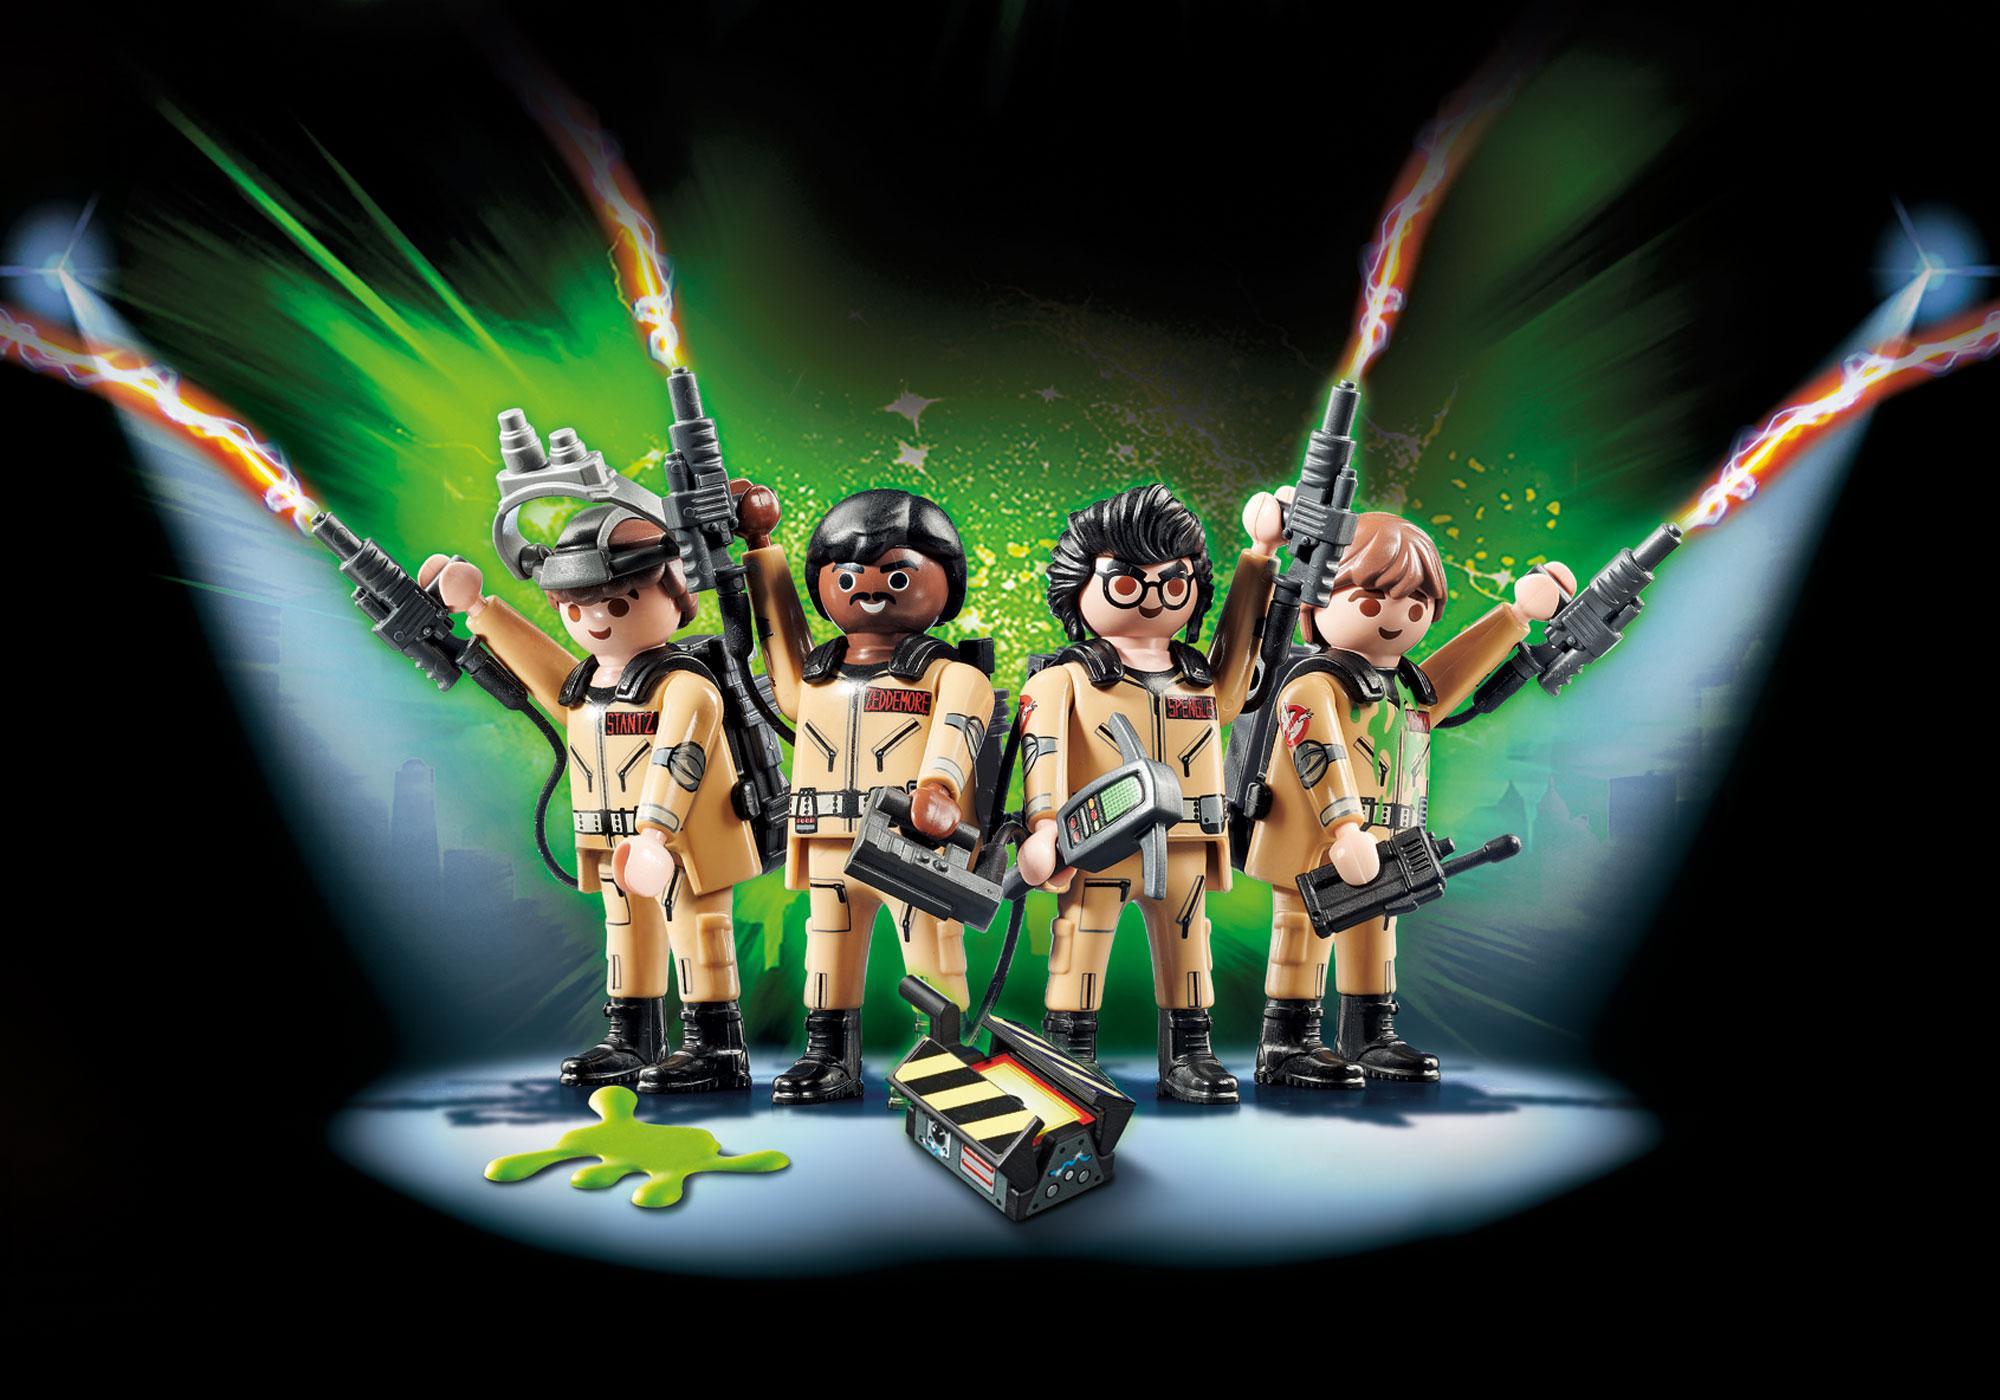 http://media.playmobil.com/i/playmobil/70175_product_detail/Ghostbusters™ Figures SetGhostbusters™